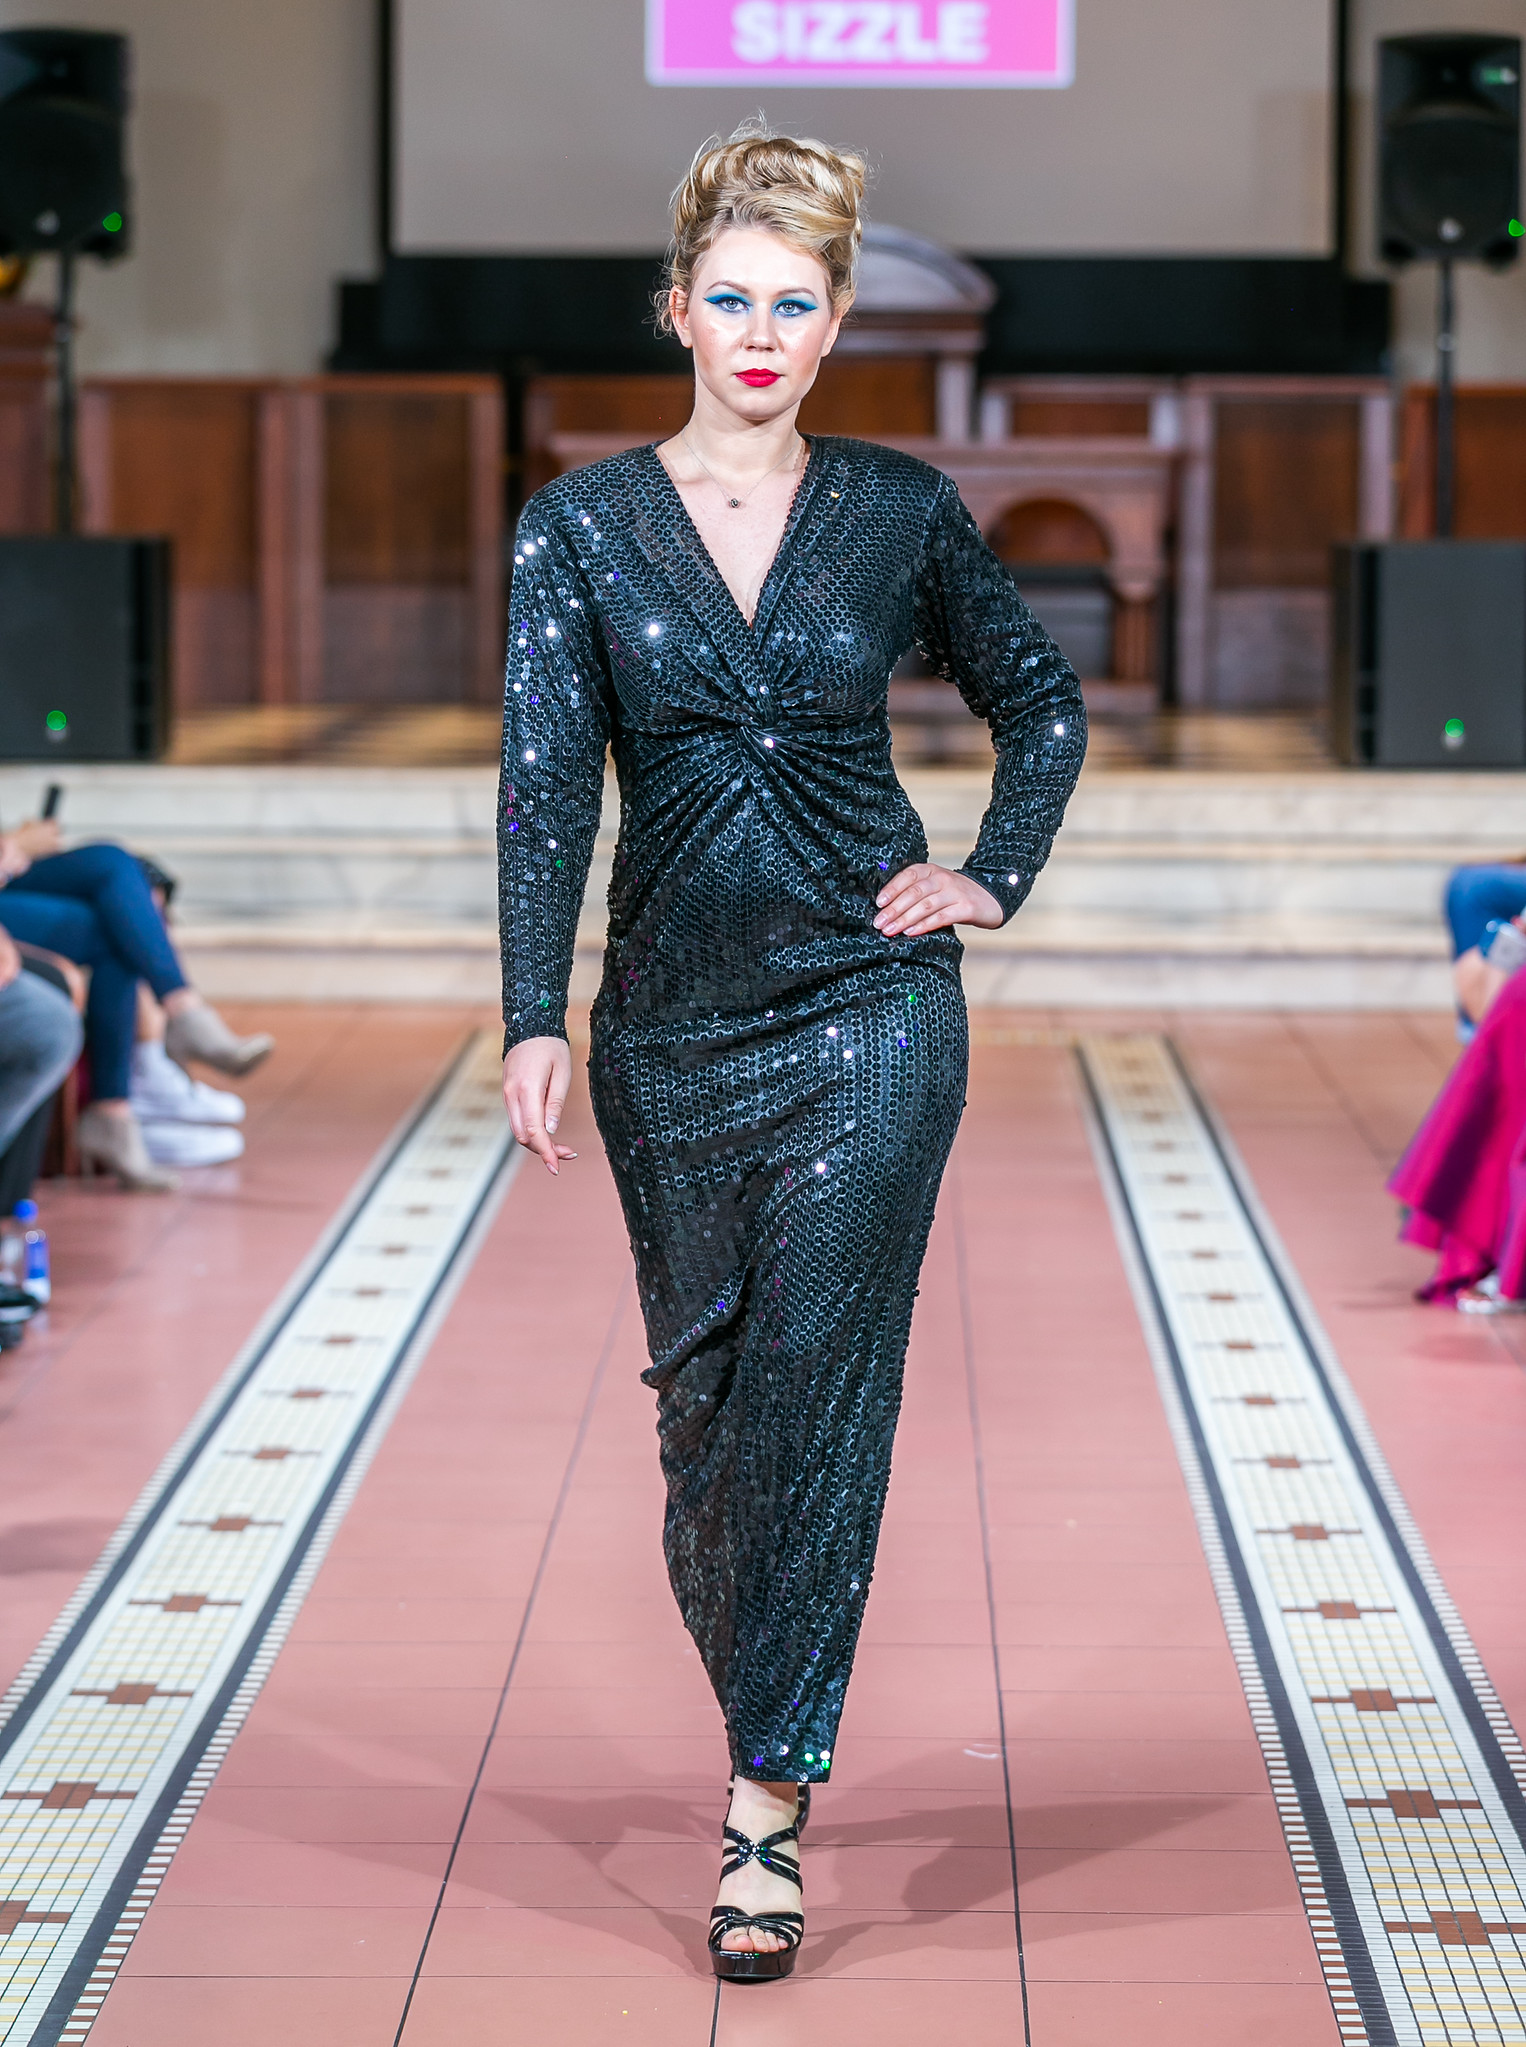 fashion-sizzle-boutique-beauty-fashion-week-2019-